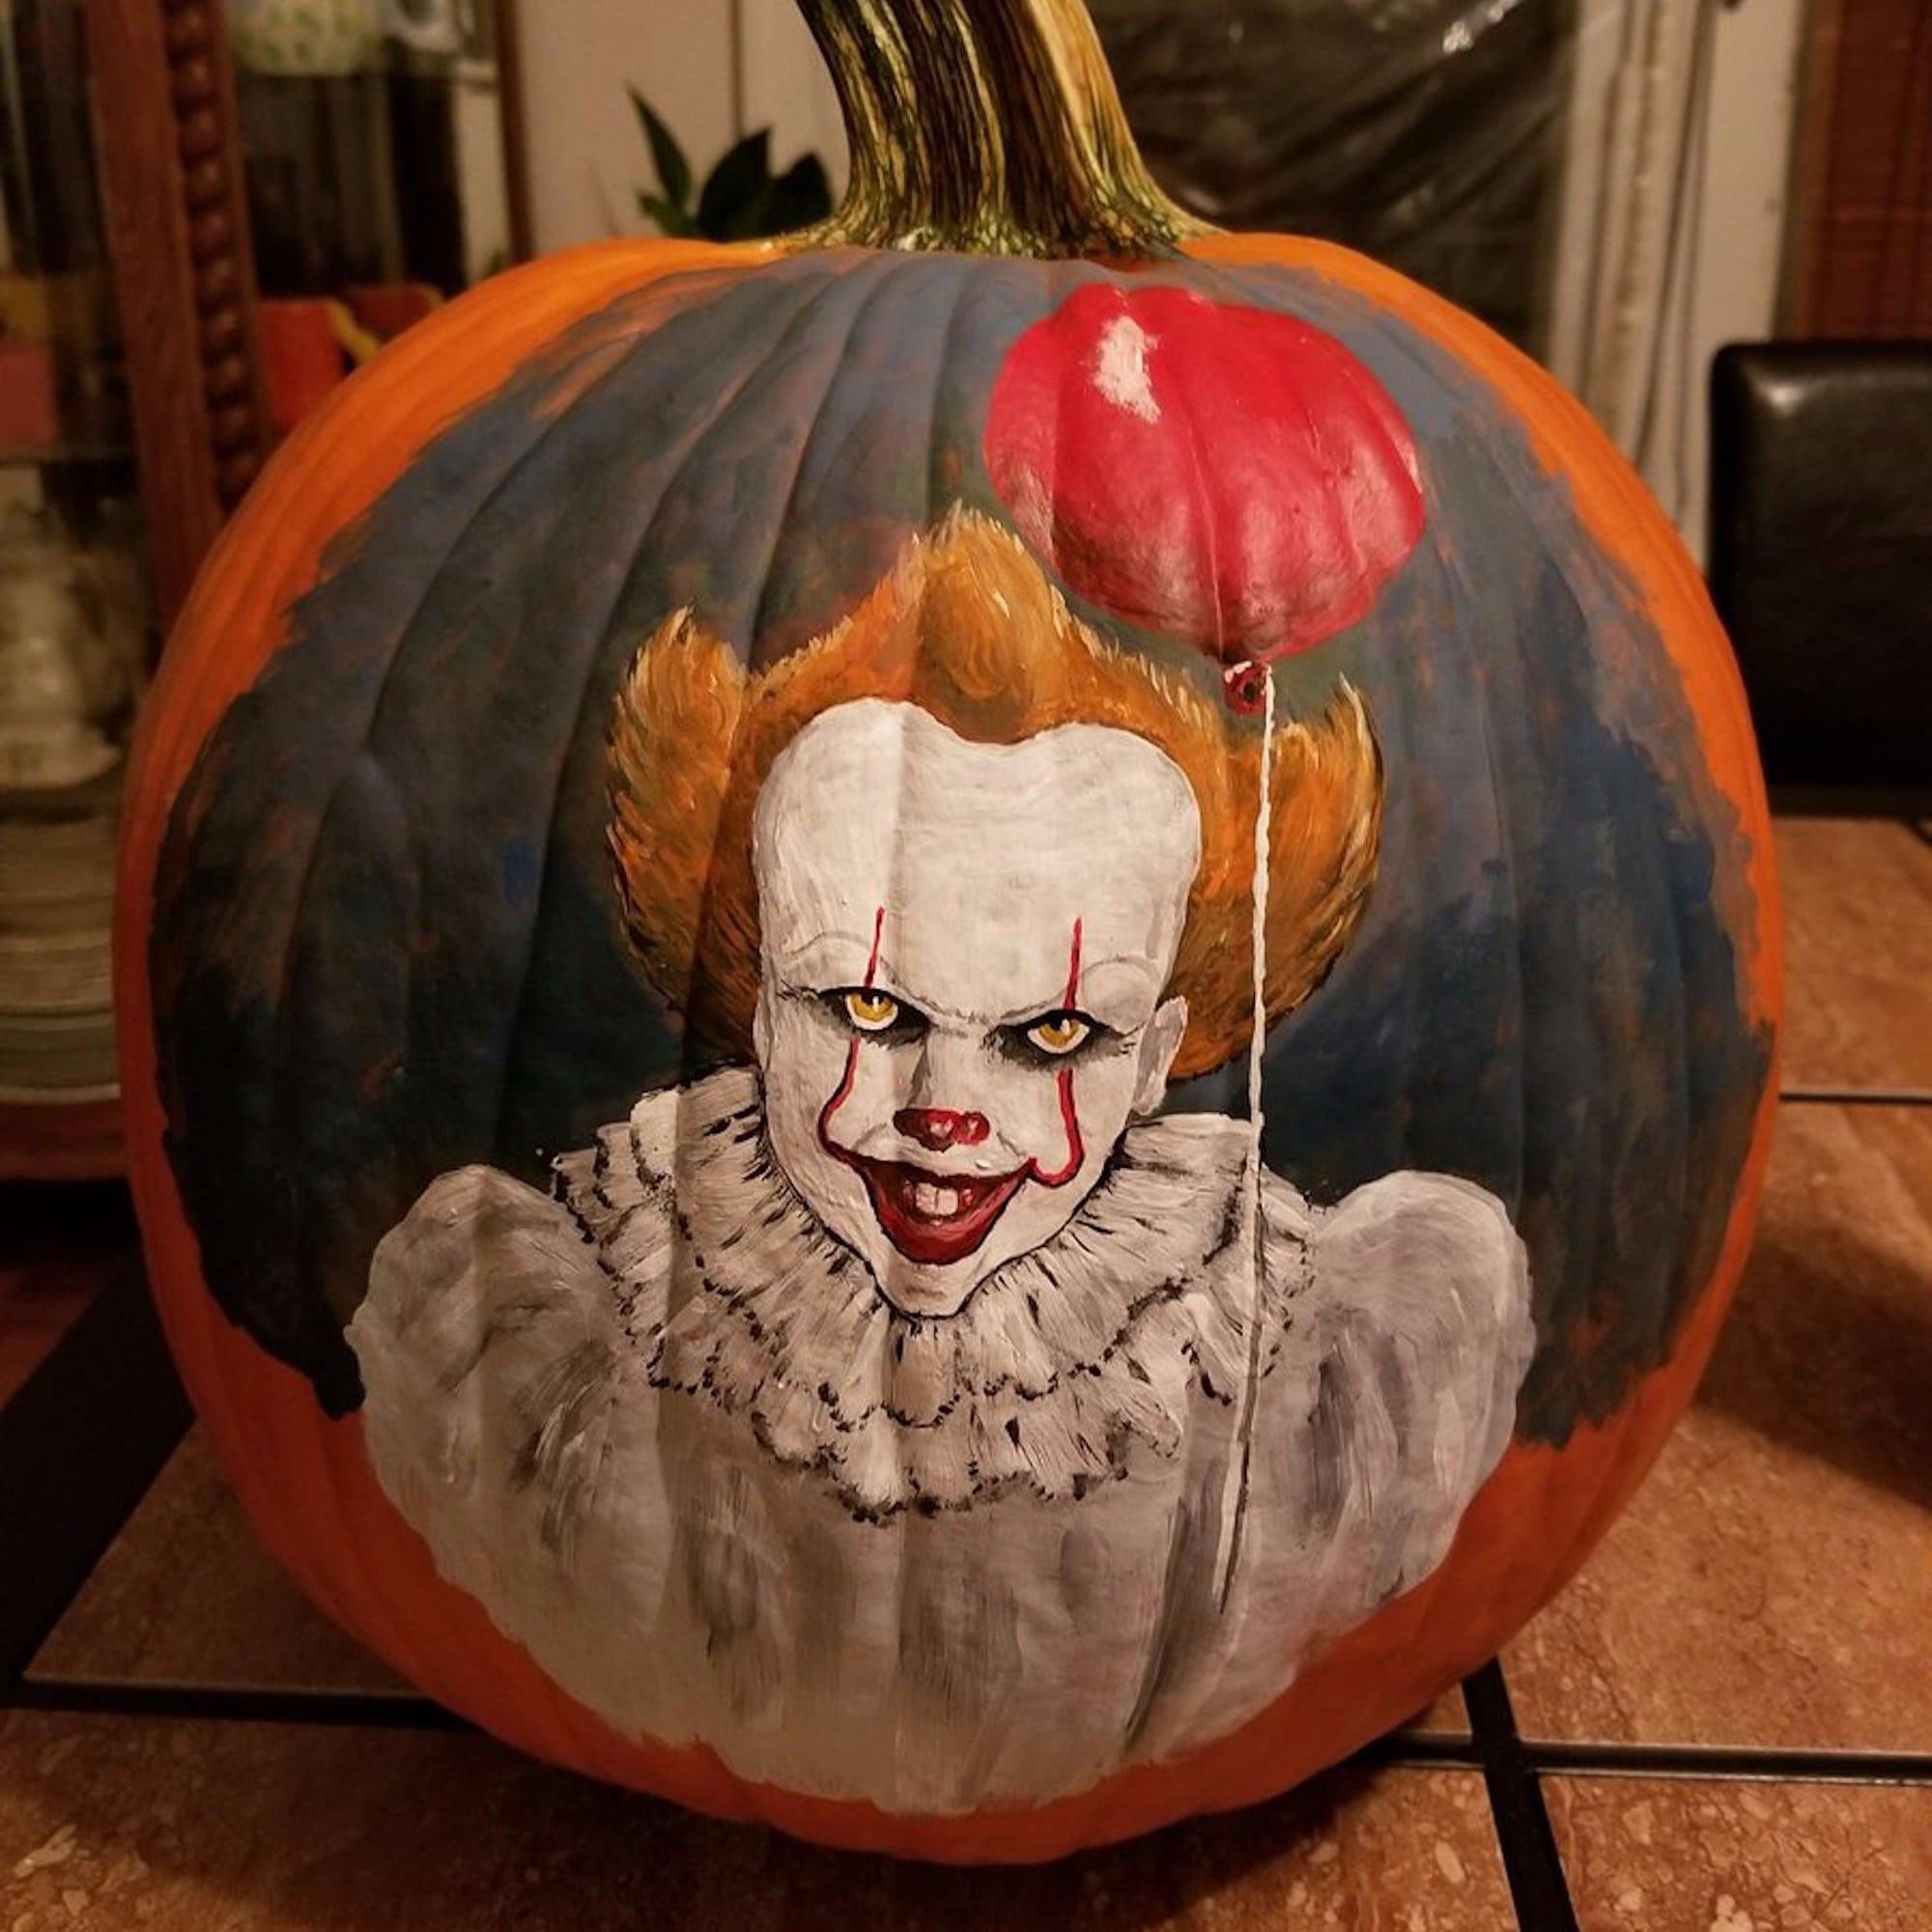 Pennywise Halloween Pumpkin Ideas | POPSUGAR Entertainment